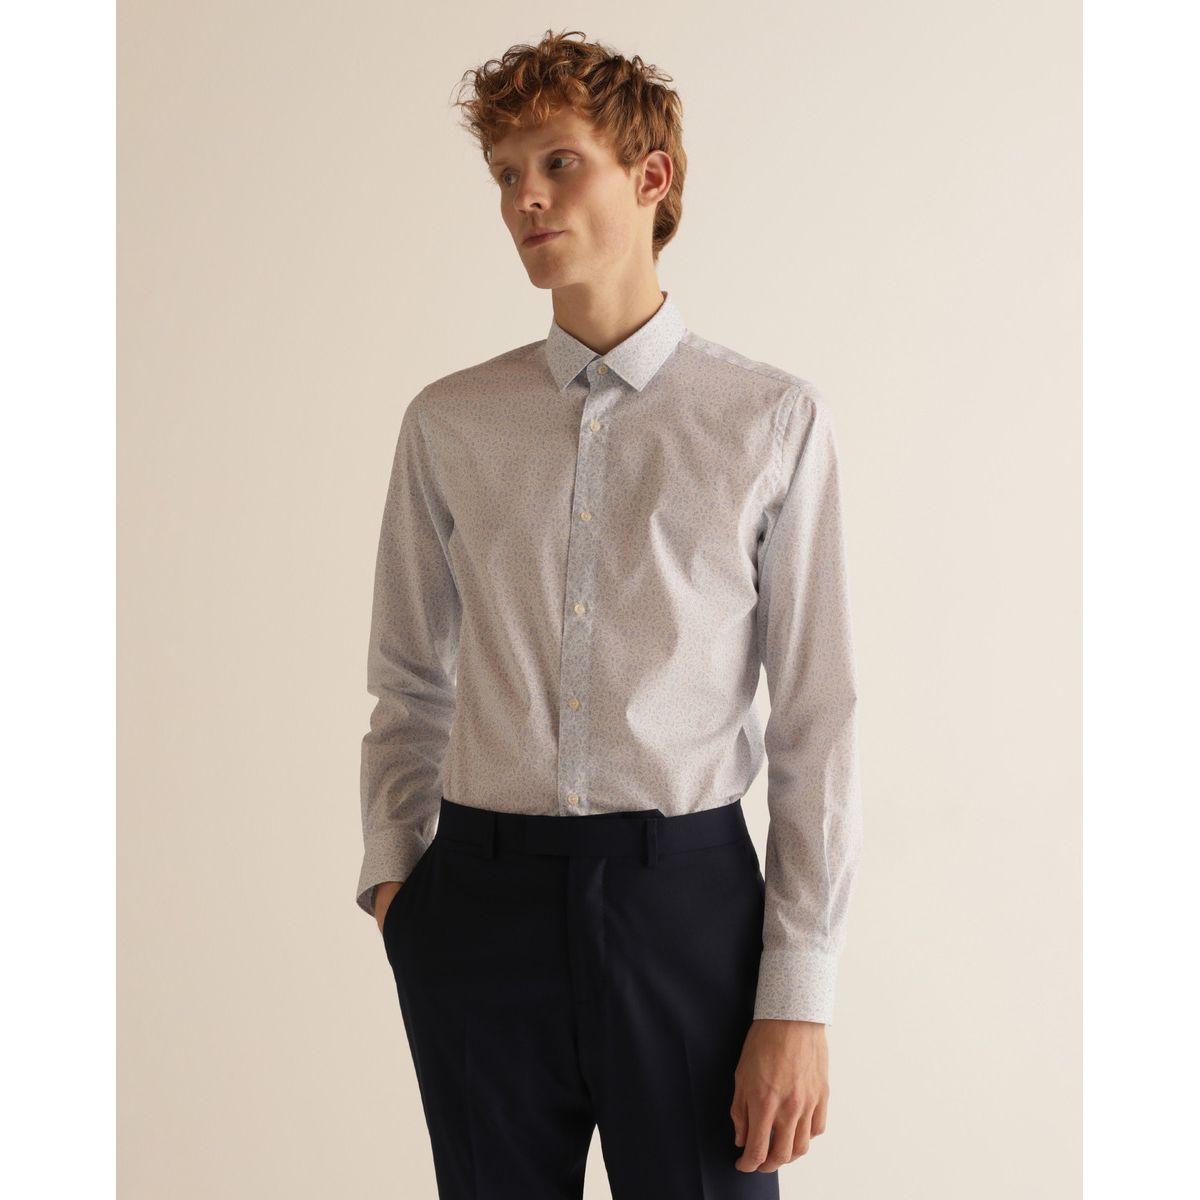 Chemise slim habillée repassage facile